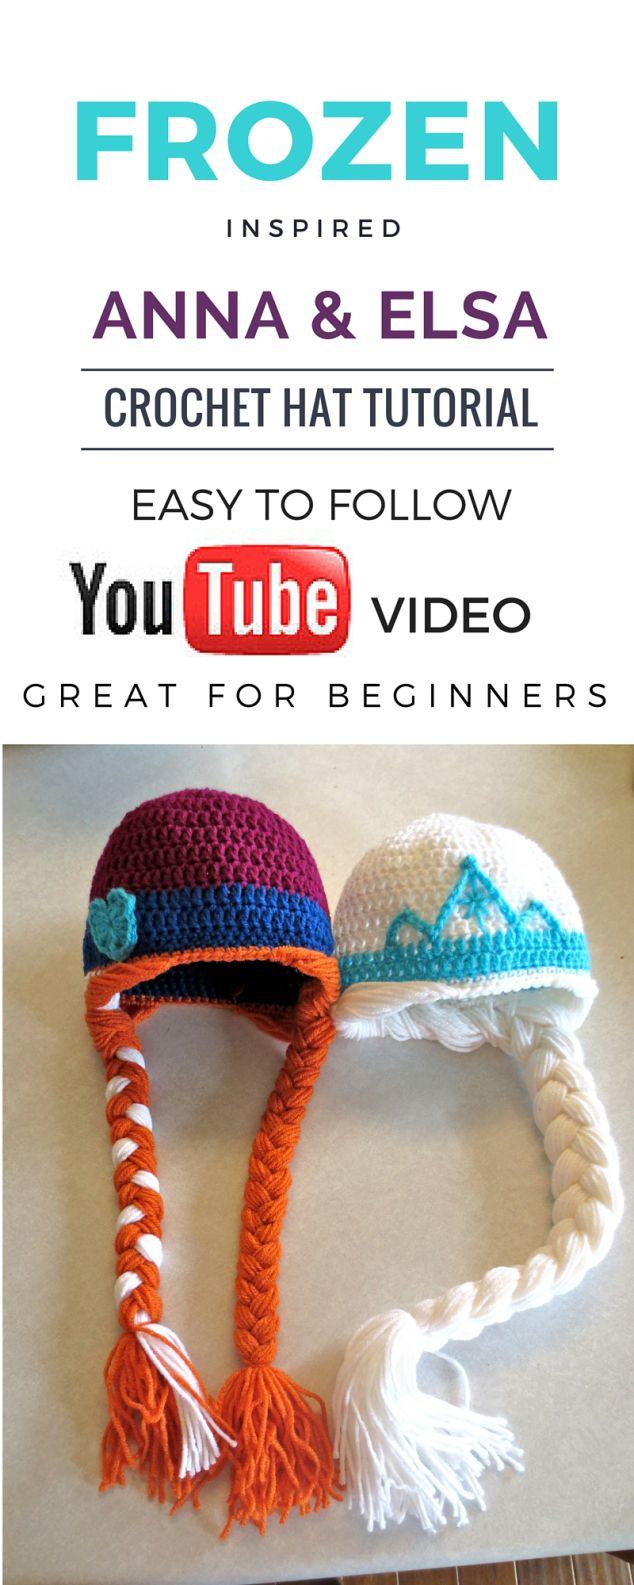 743 best crochet / tricot images on Pinterest | Crochet crafts ...